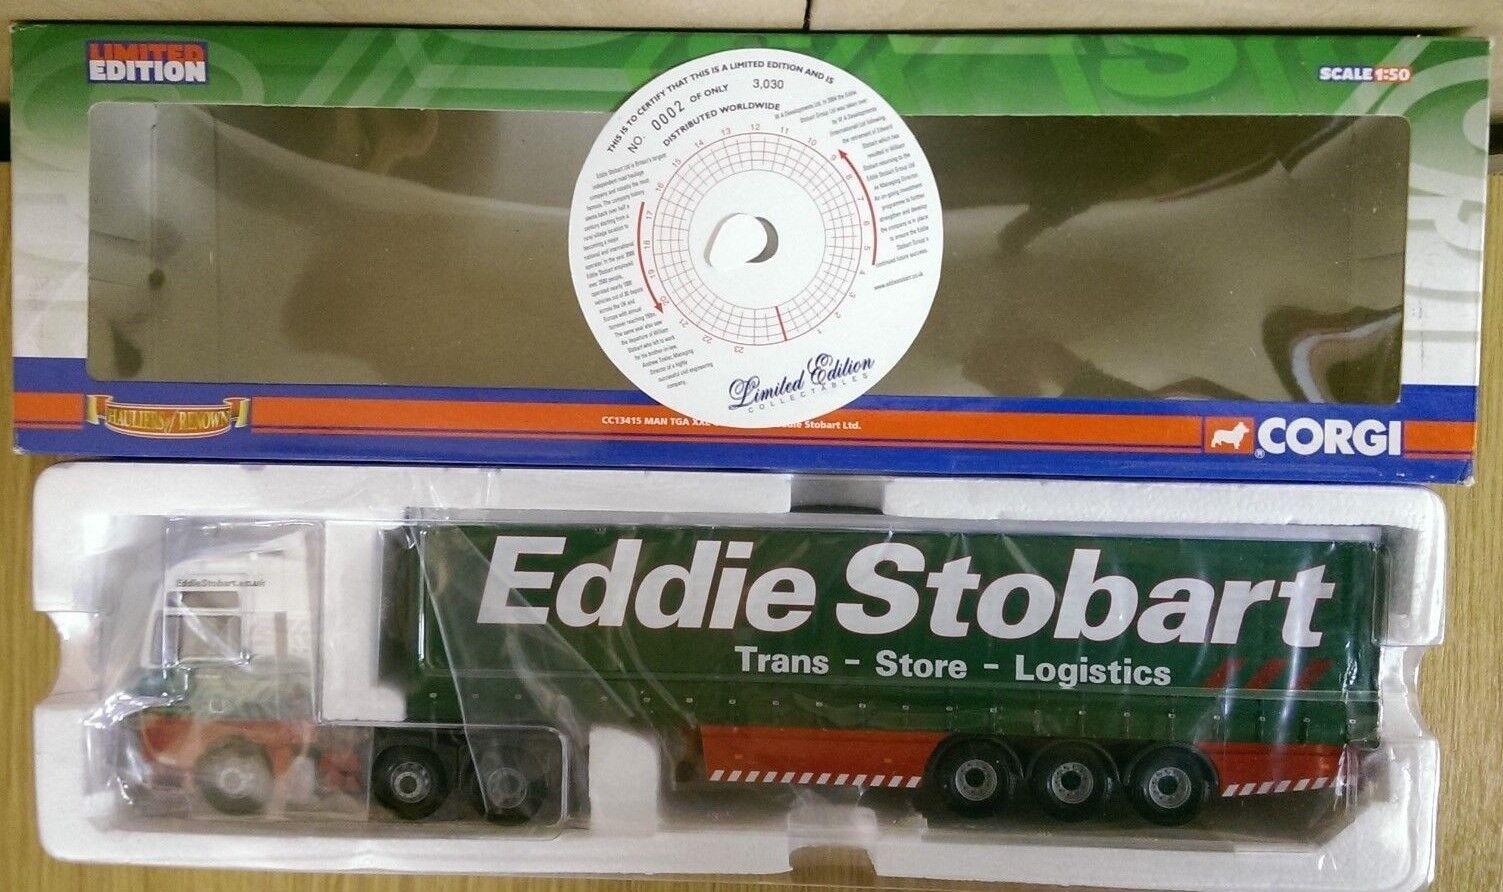 CORGI CC13415 MAN TGA XXL CURTAINSIDE Eddie Stobart LTD ED Nº 0002 del 3030